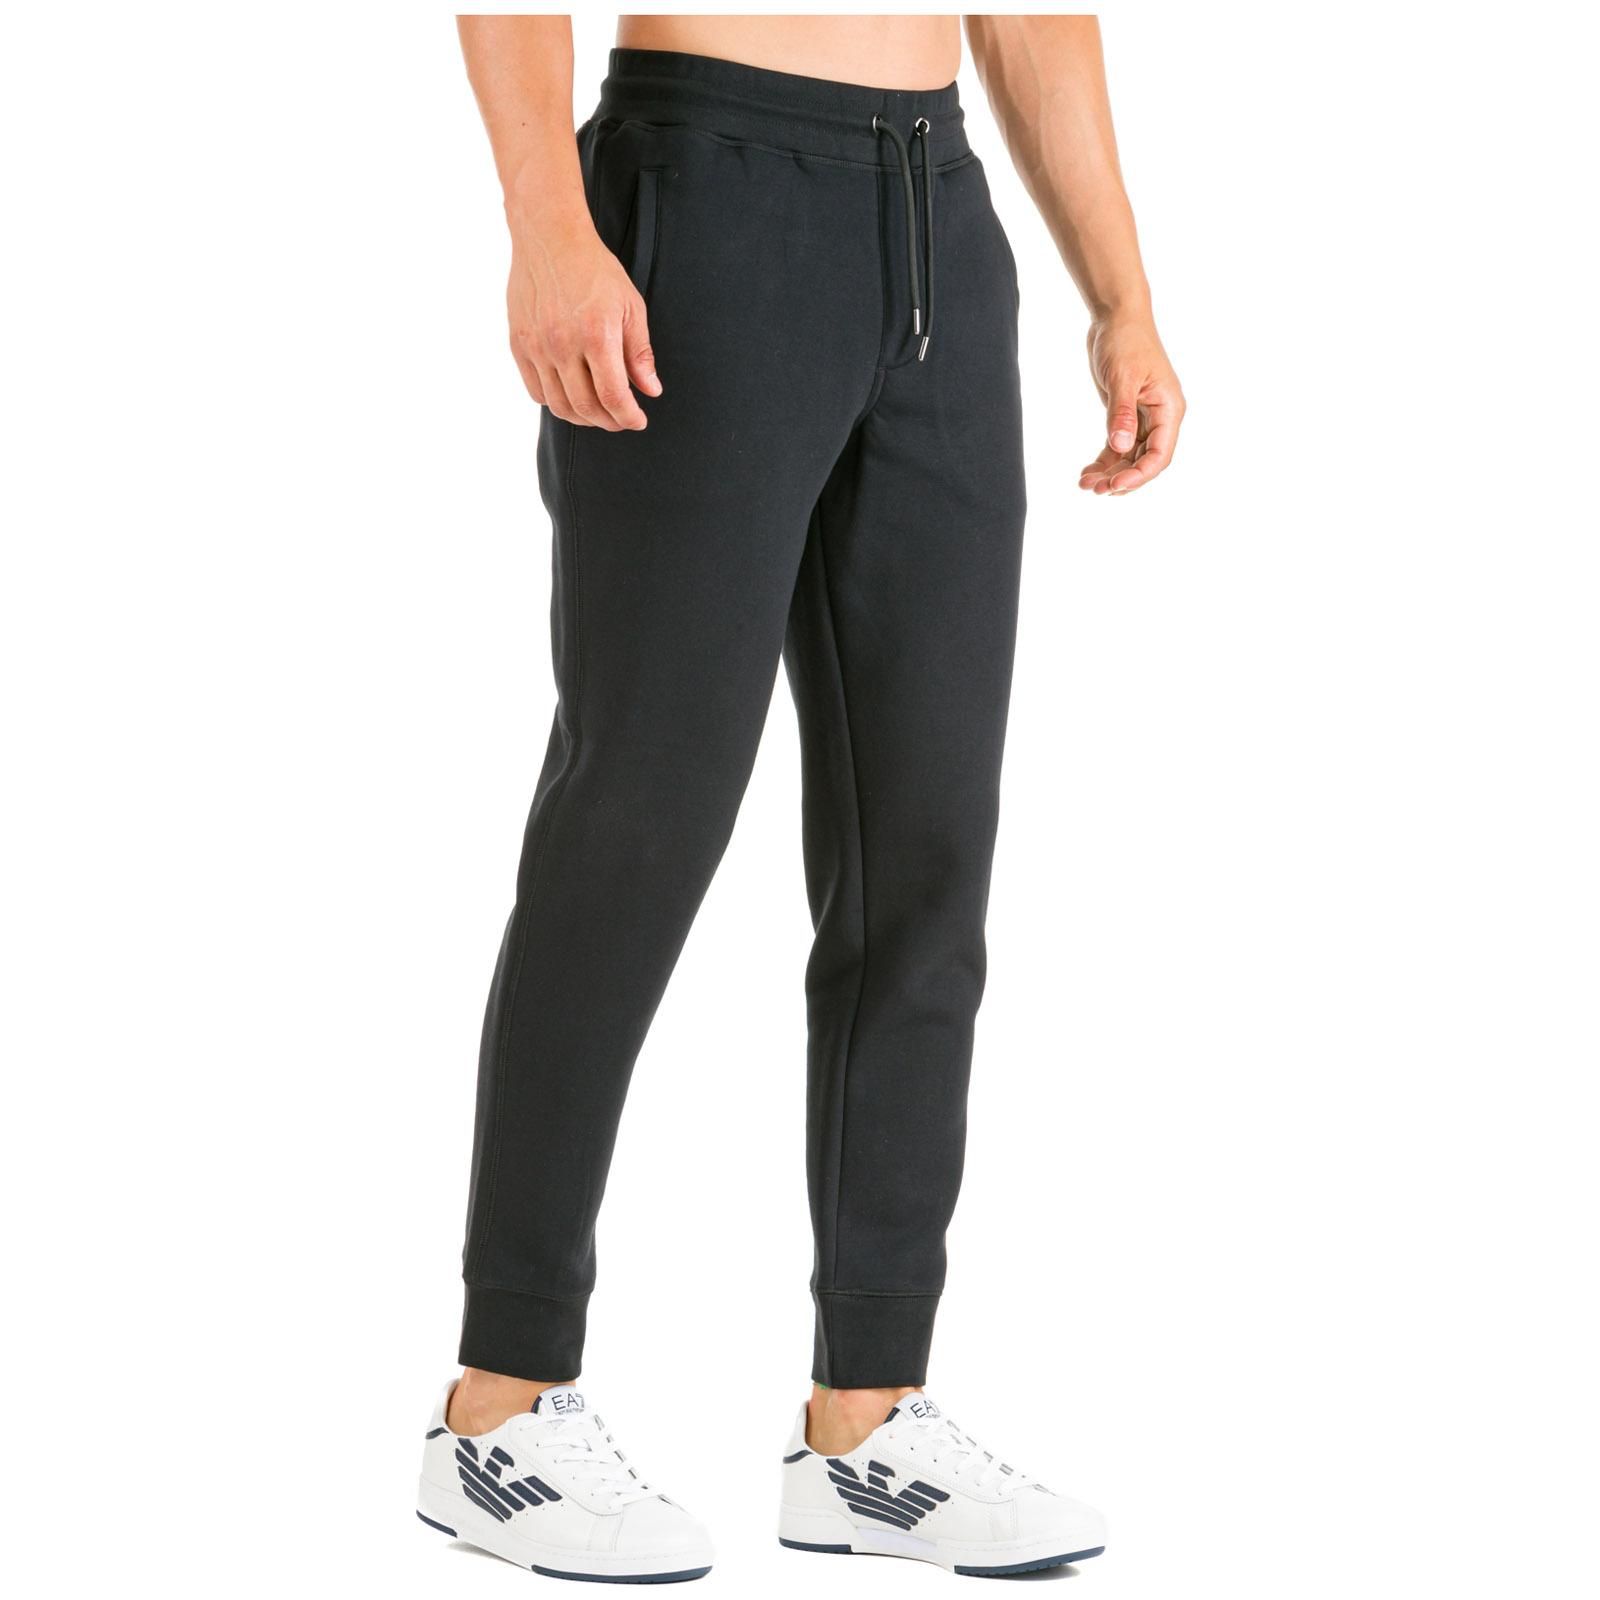 hot sale online 16905 c67b9 Pantaloni tuta uomo